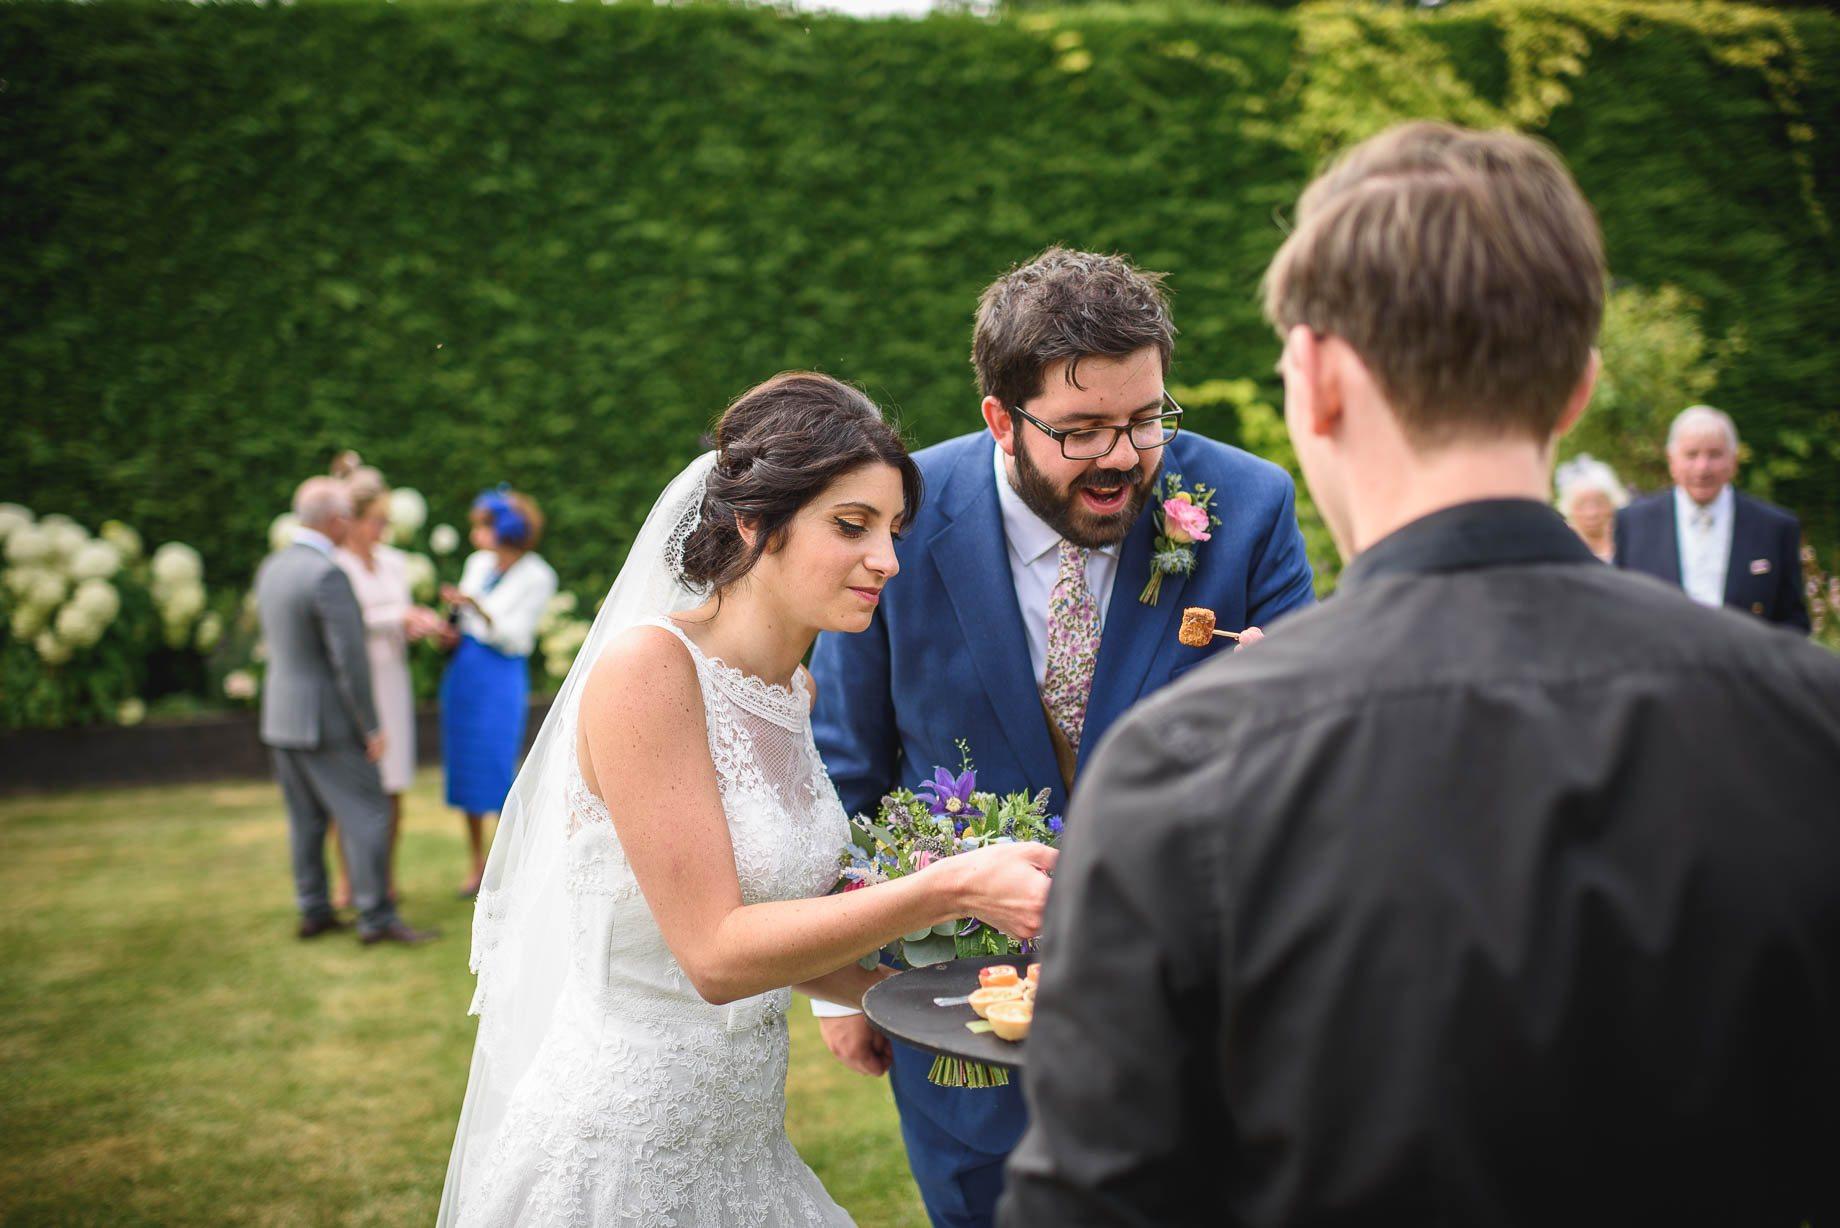 Gaynes Park wedding photography - Guy Collier Photography - Rachel and Jon (99 of 169)